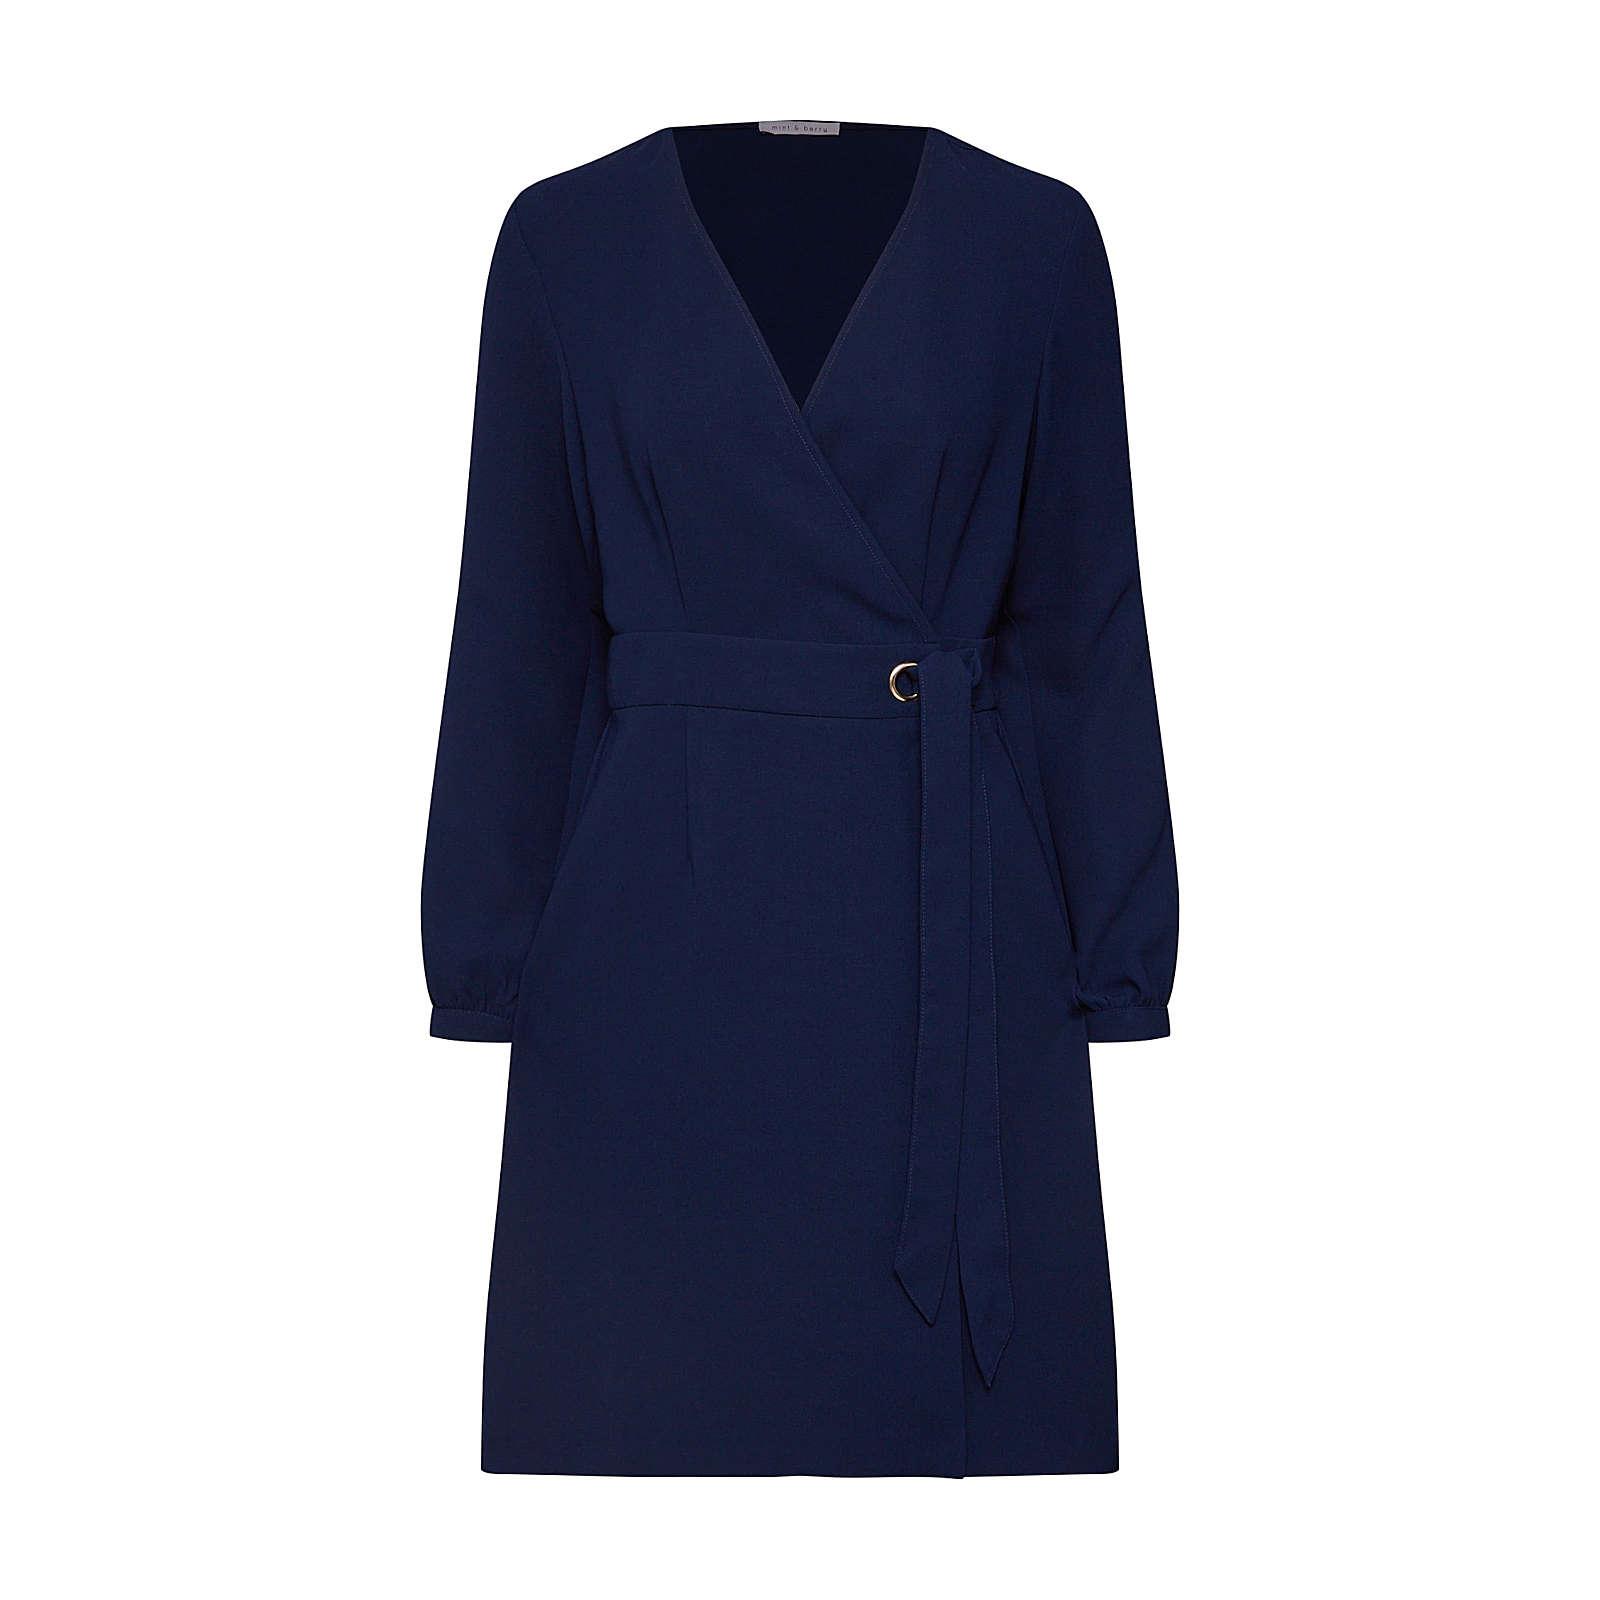 mint&berry Blusenkleid Blusenkleider blau Damen Gr. 38